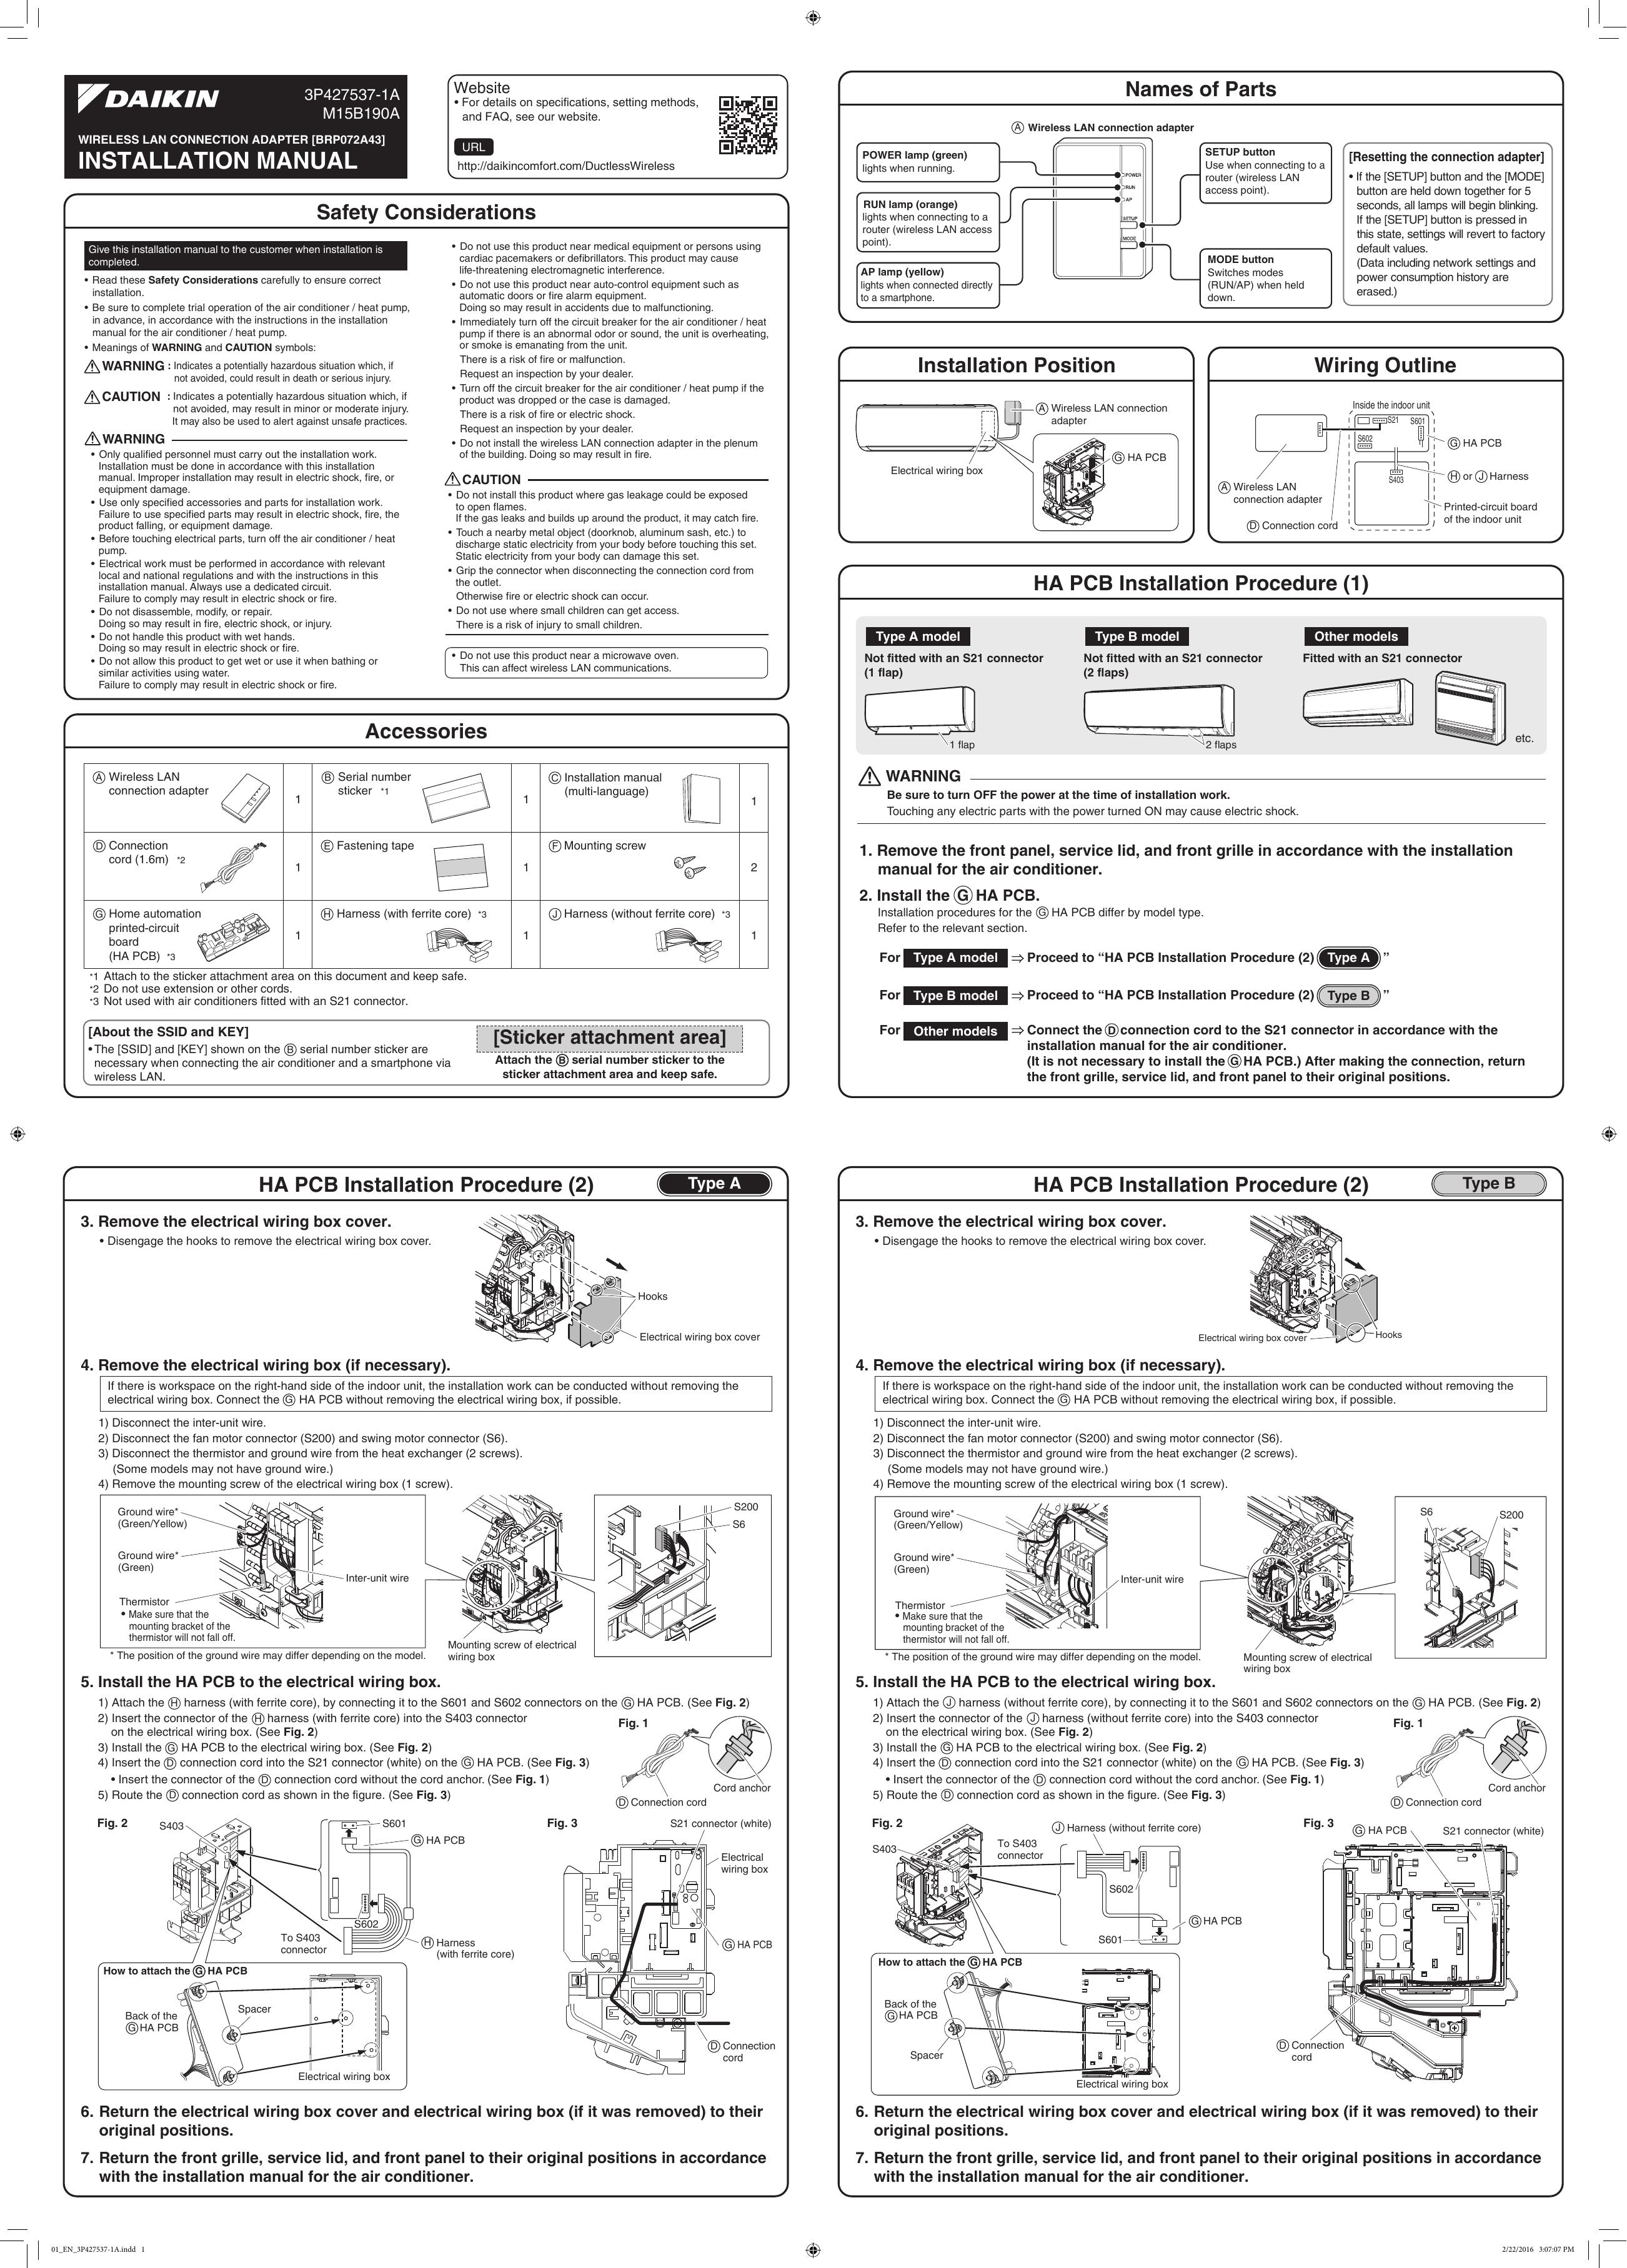 installation manual - Daikin VRV Pro Contractor | manualzz.com on